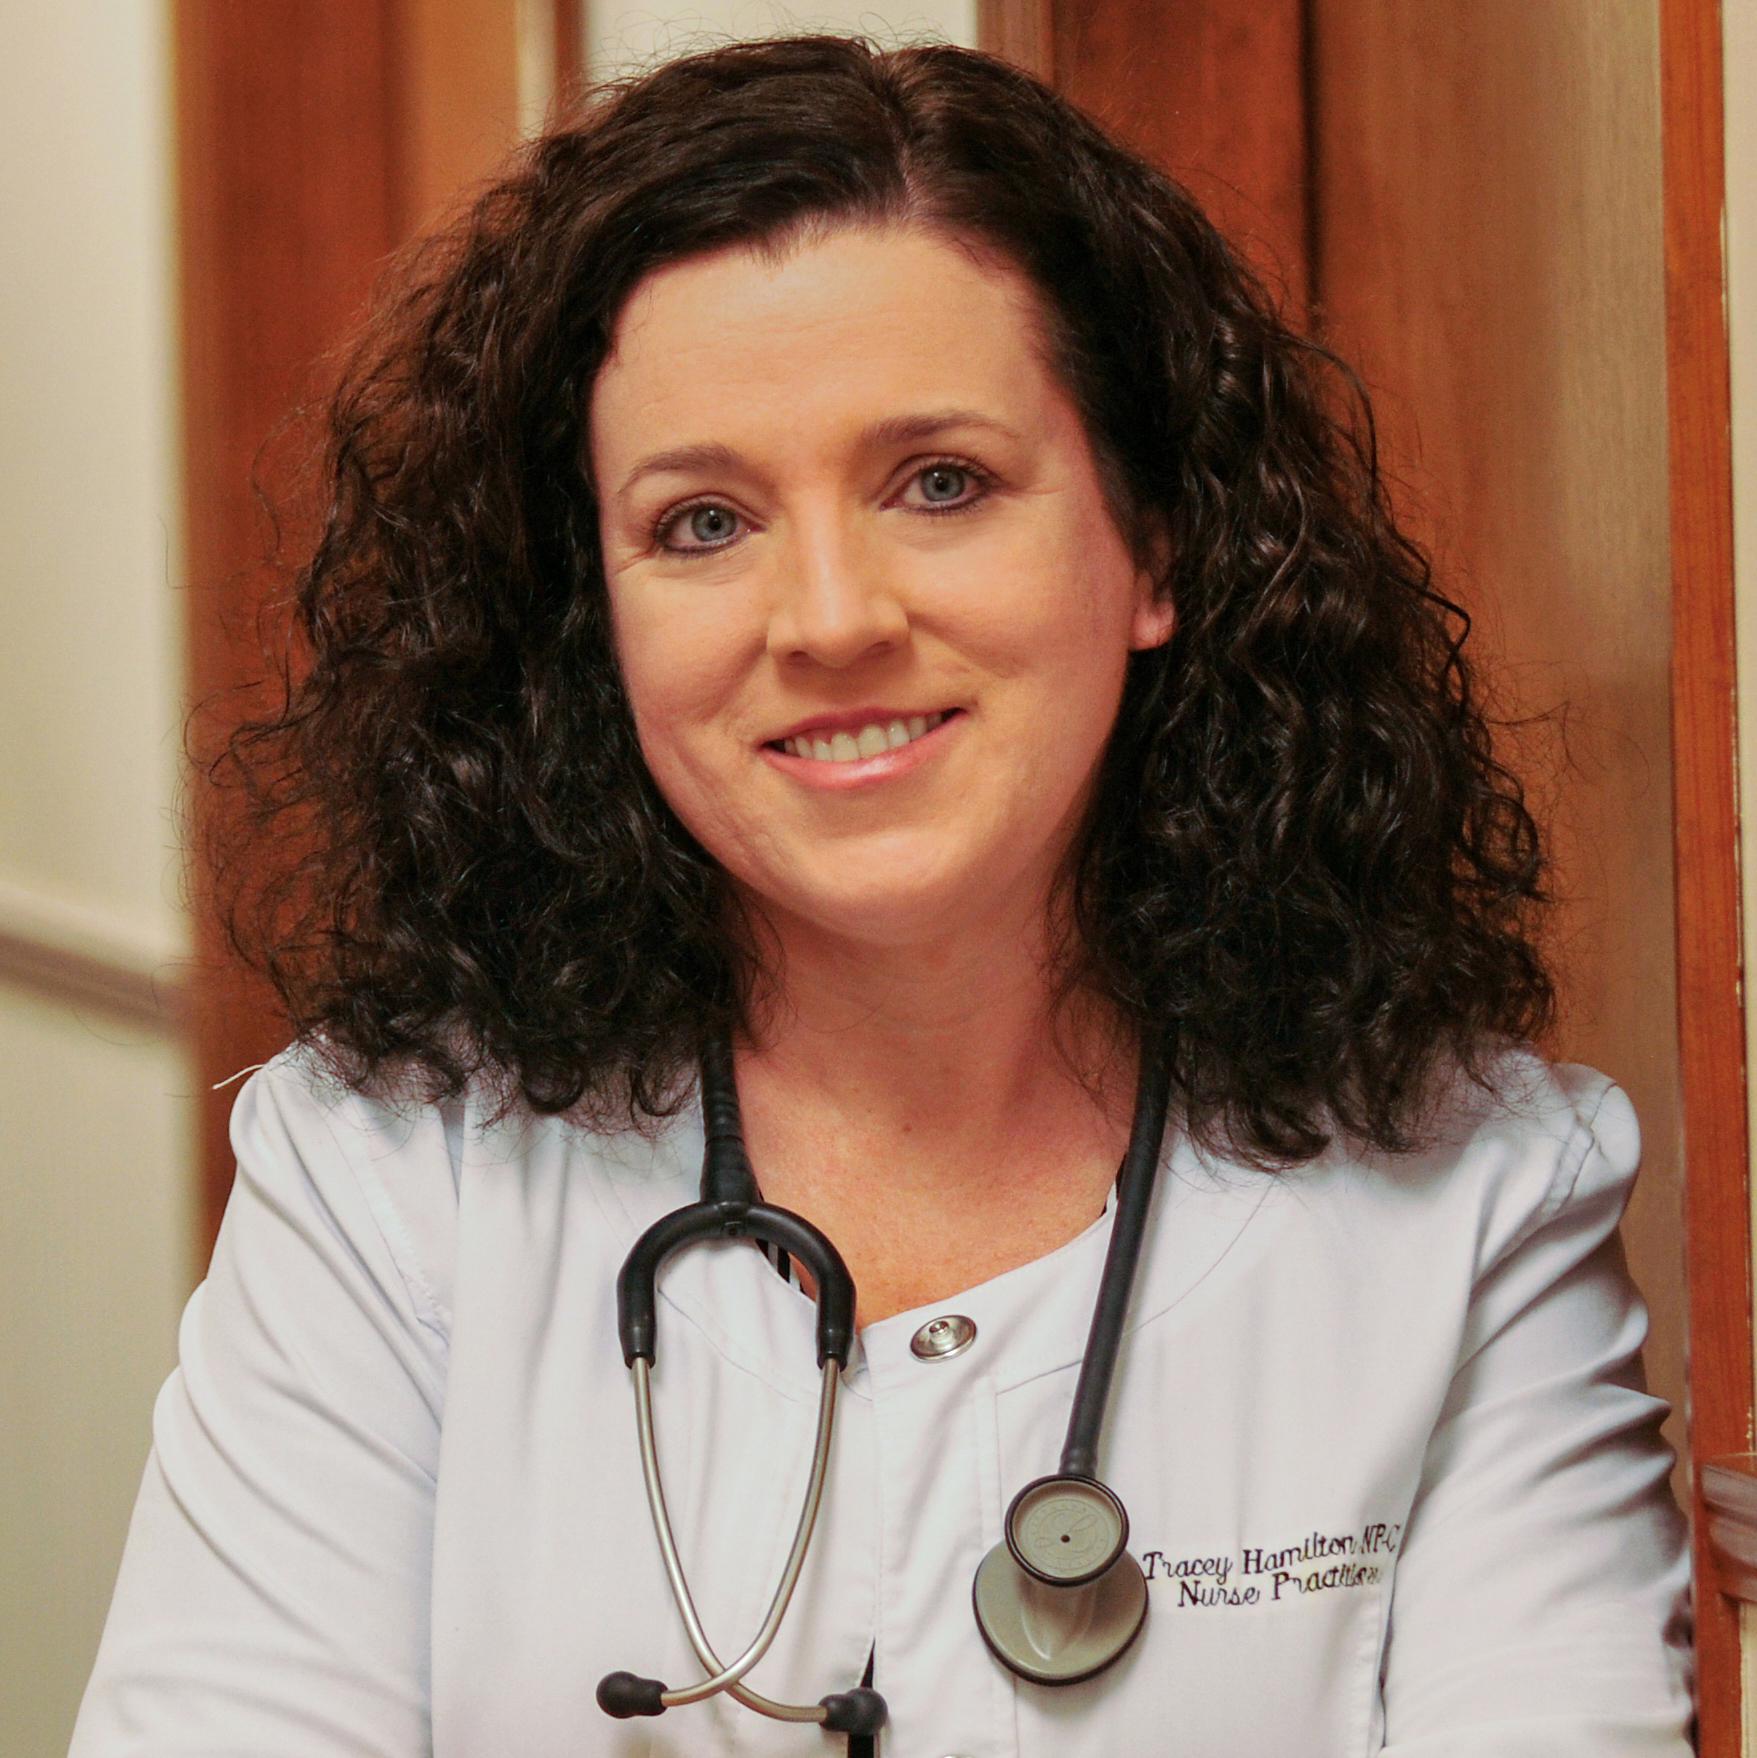 Tracey Hedrick-Hamilton, APRN - Family Physician